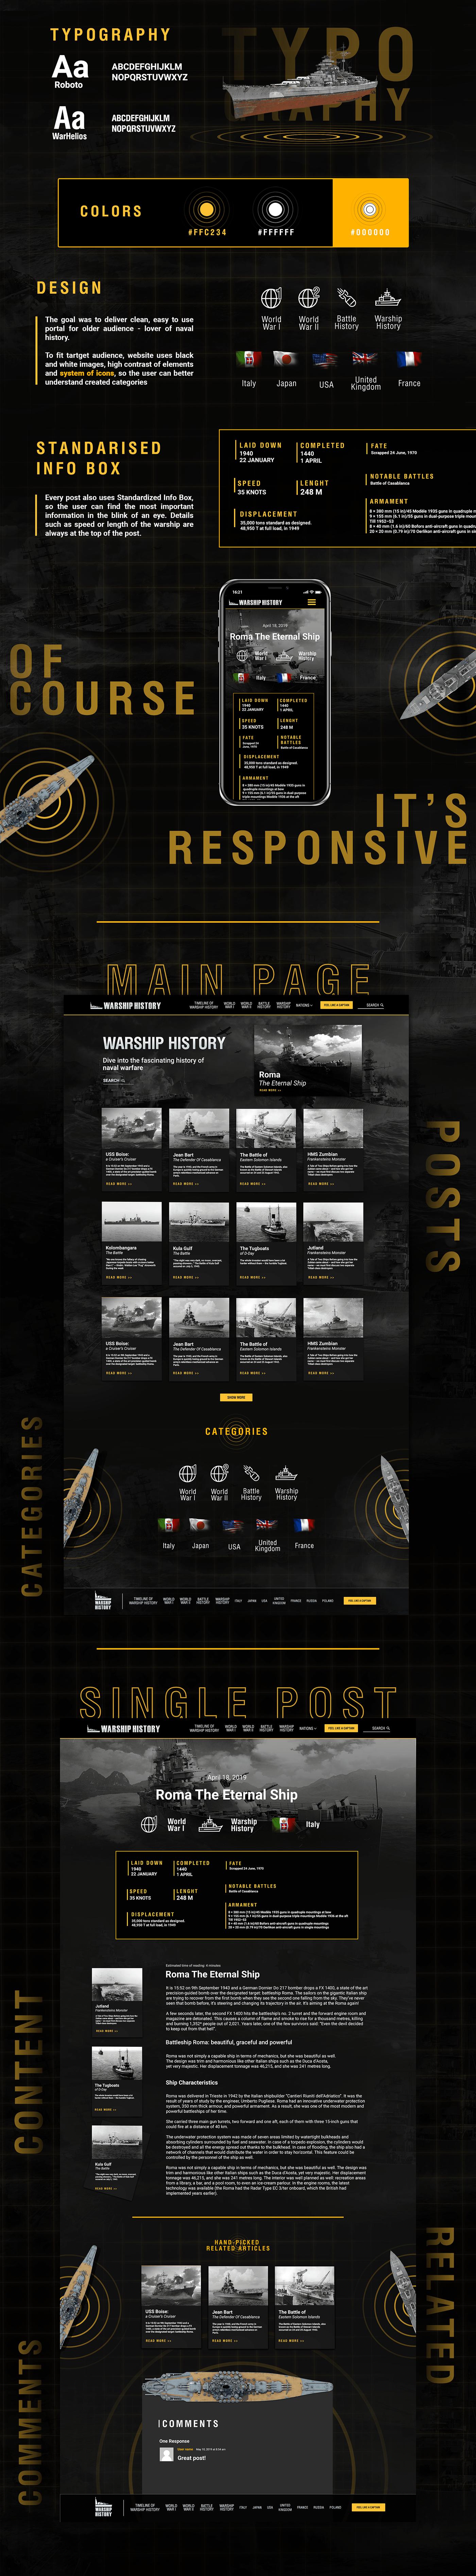 warship warships history naval sea Website Blog microsite Experience wargaming